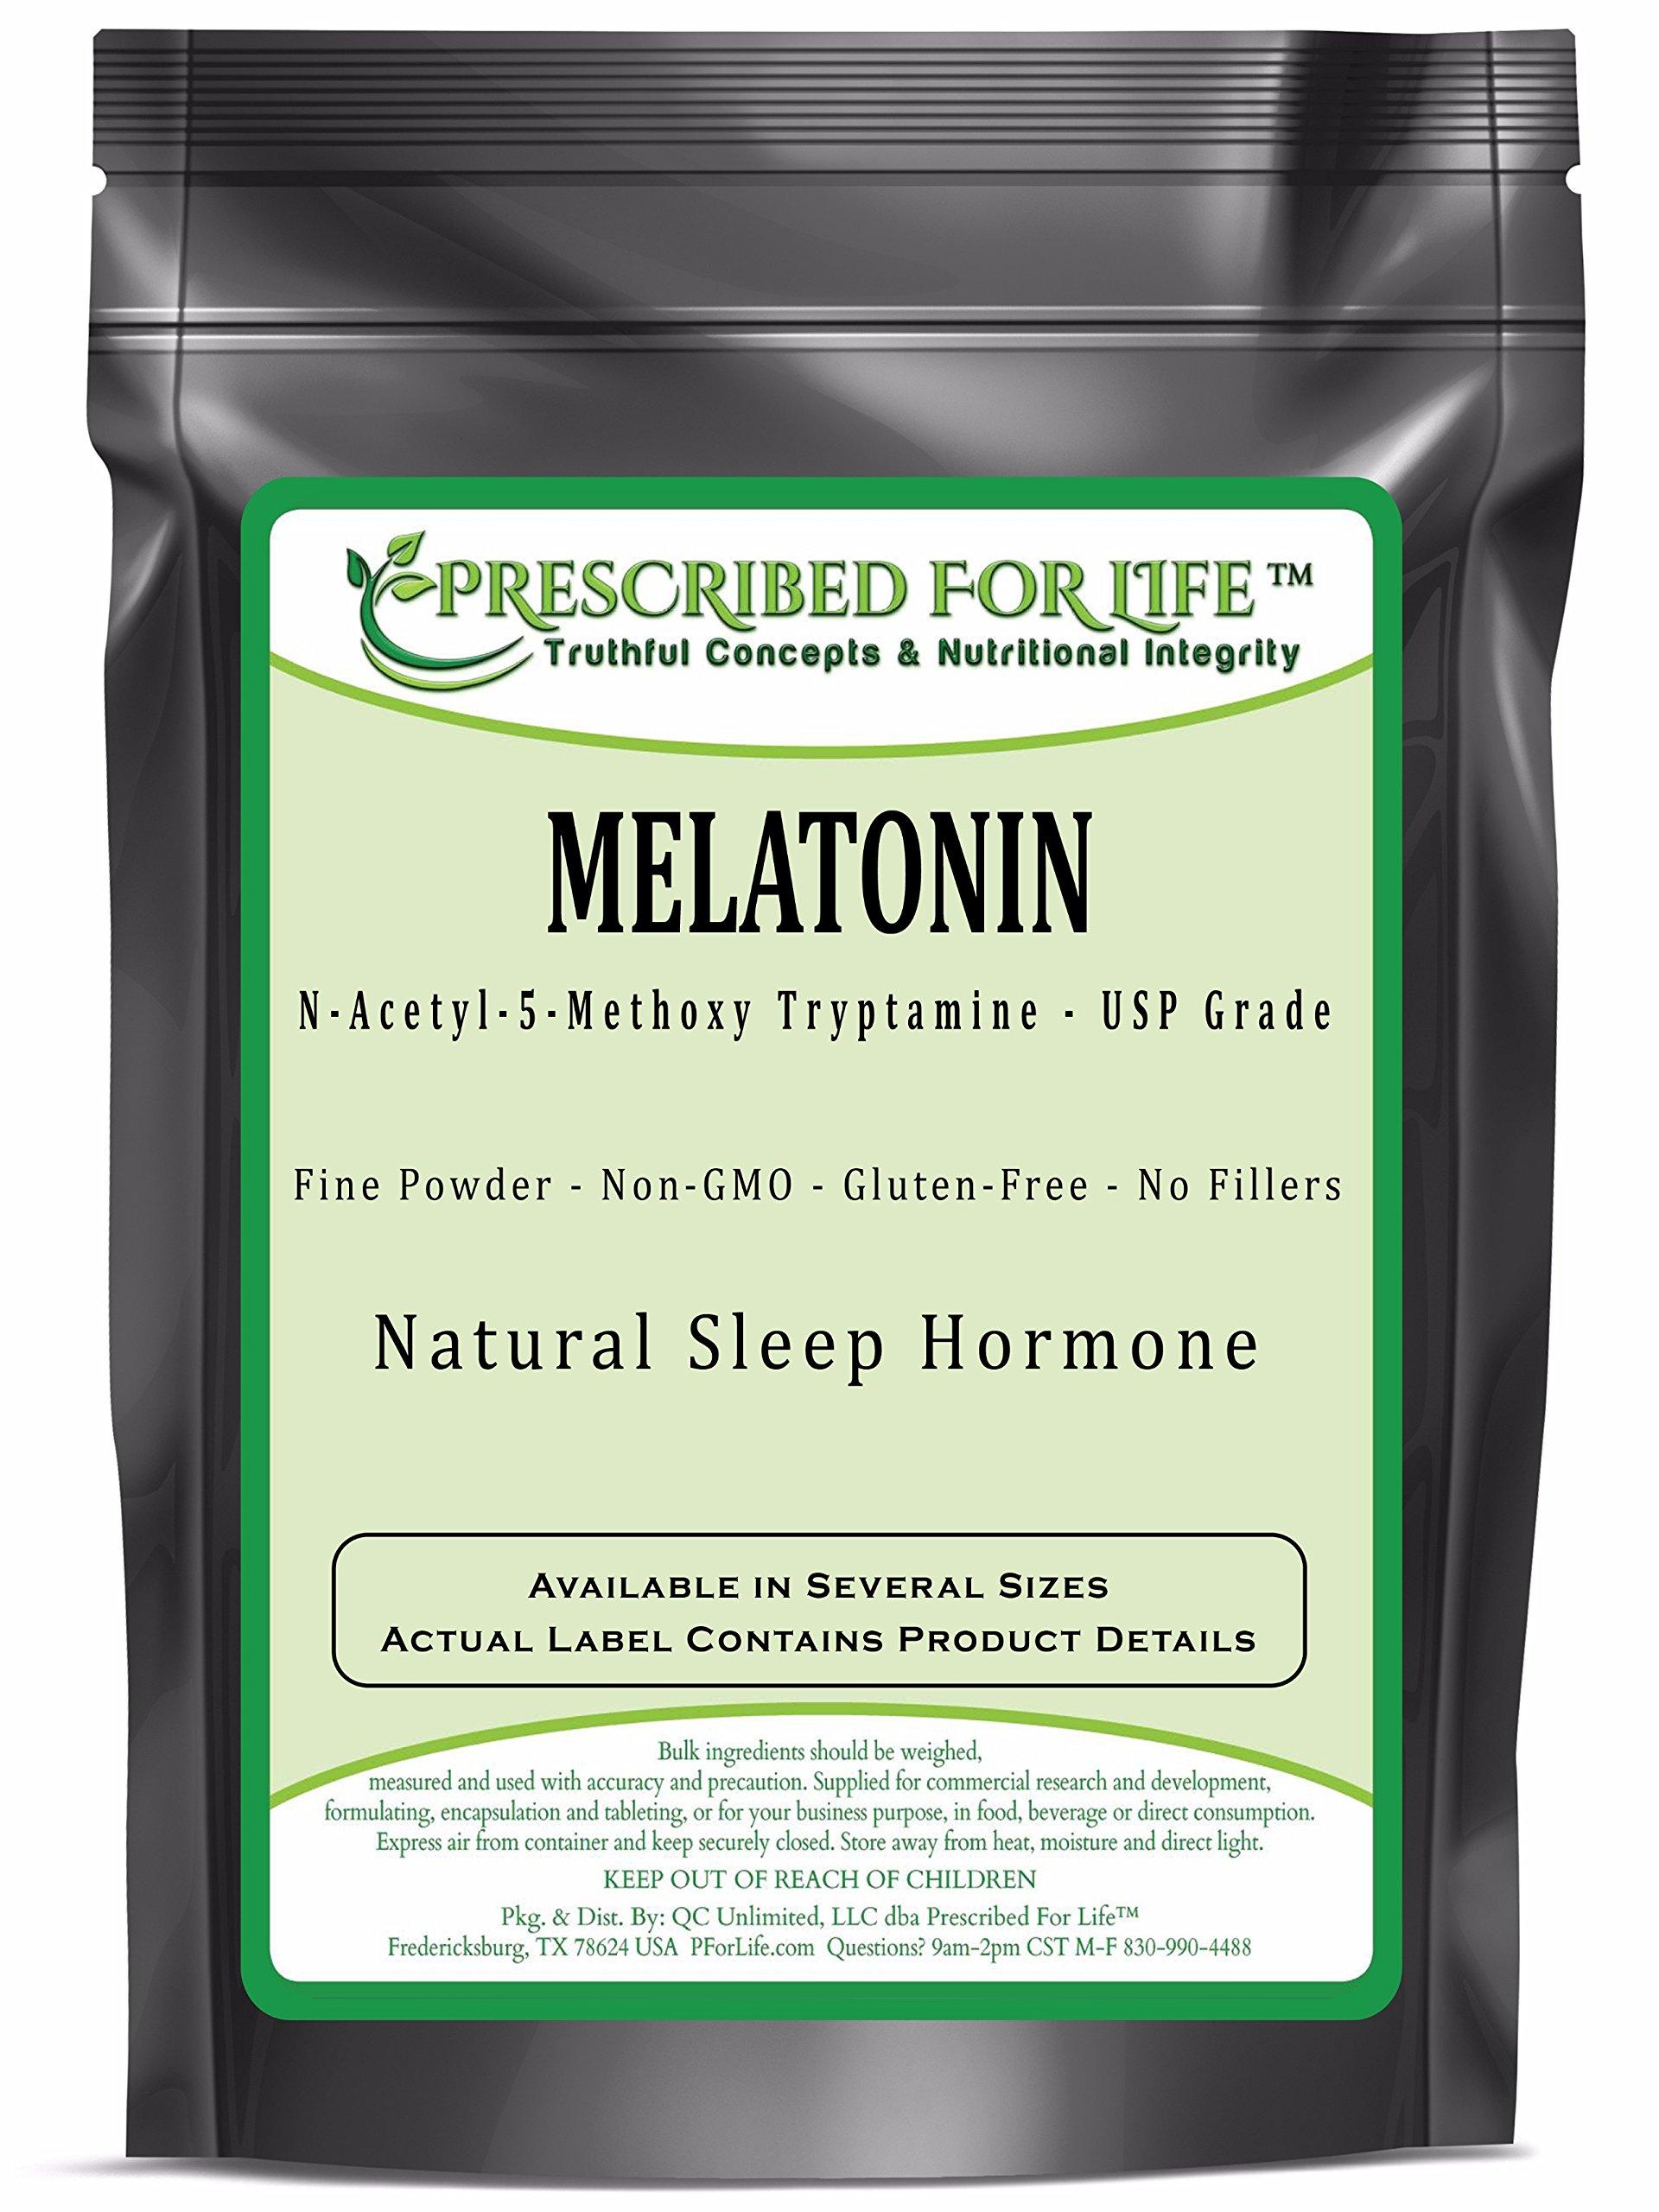 Melatonin - N-Acetyl-5-Methoxy Tryptamine Powder - Natural Sleep Hormone, 12 oz